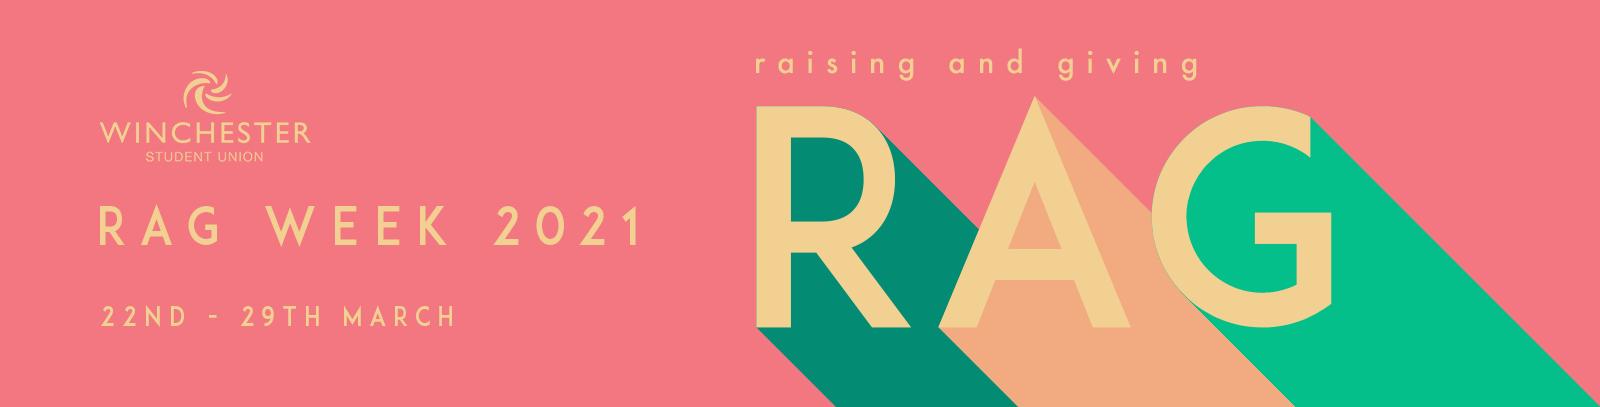 Rag web banner